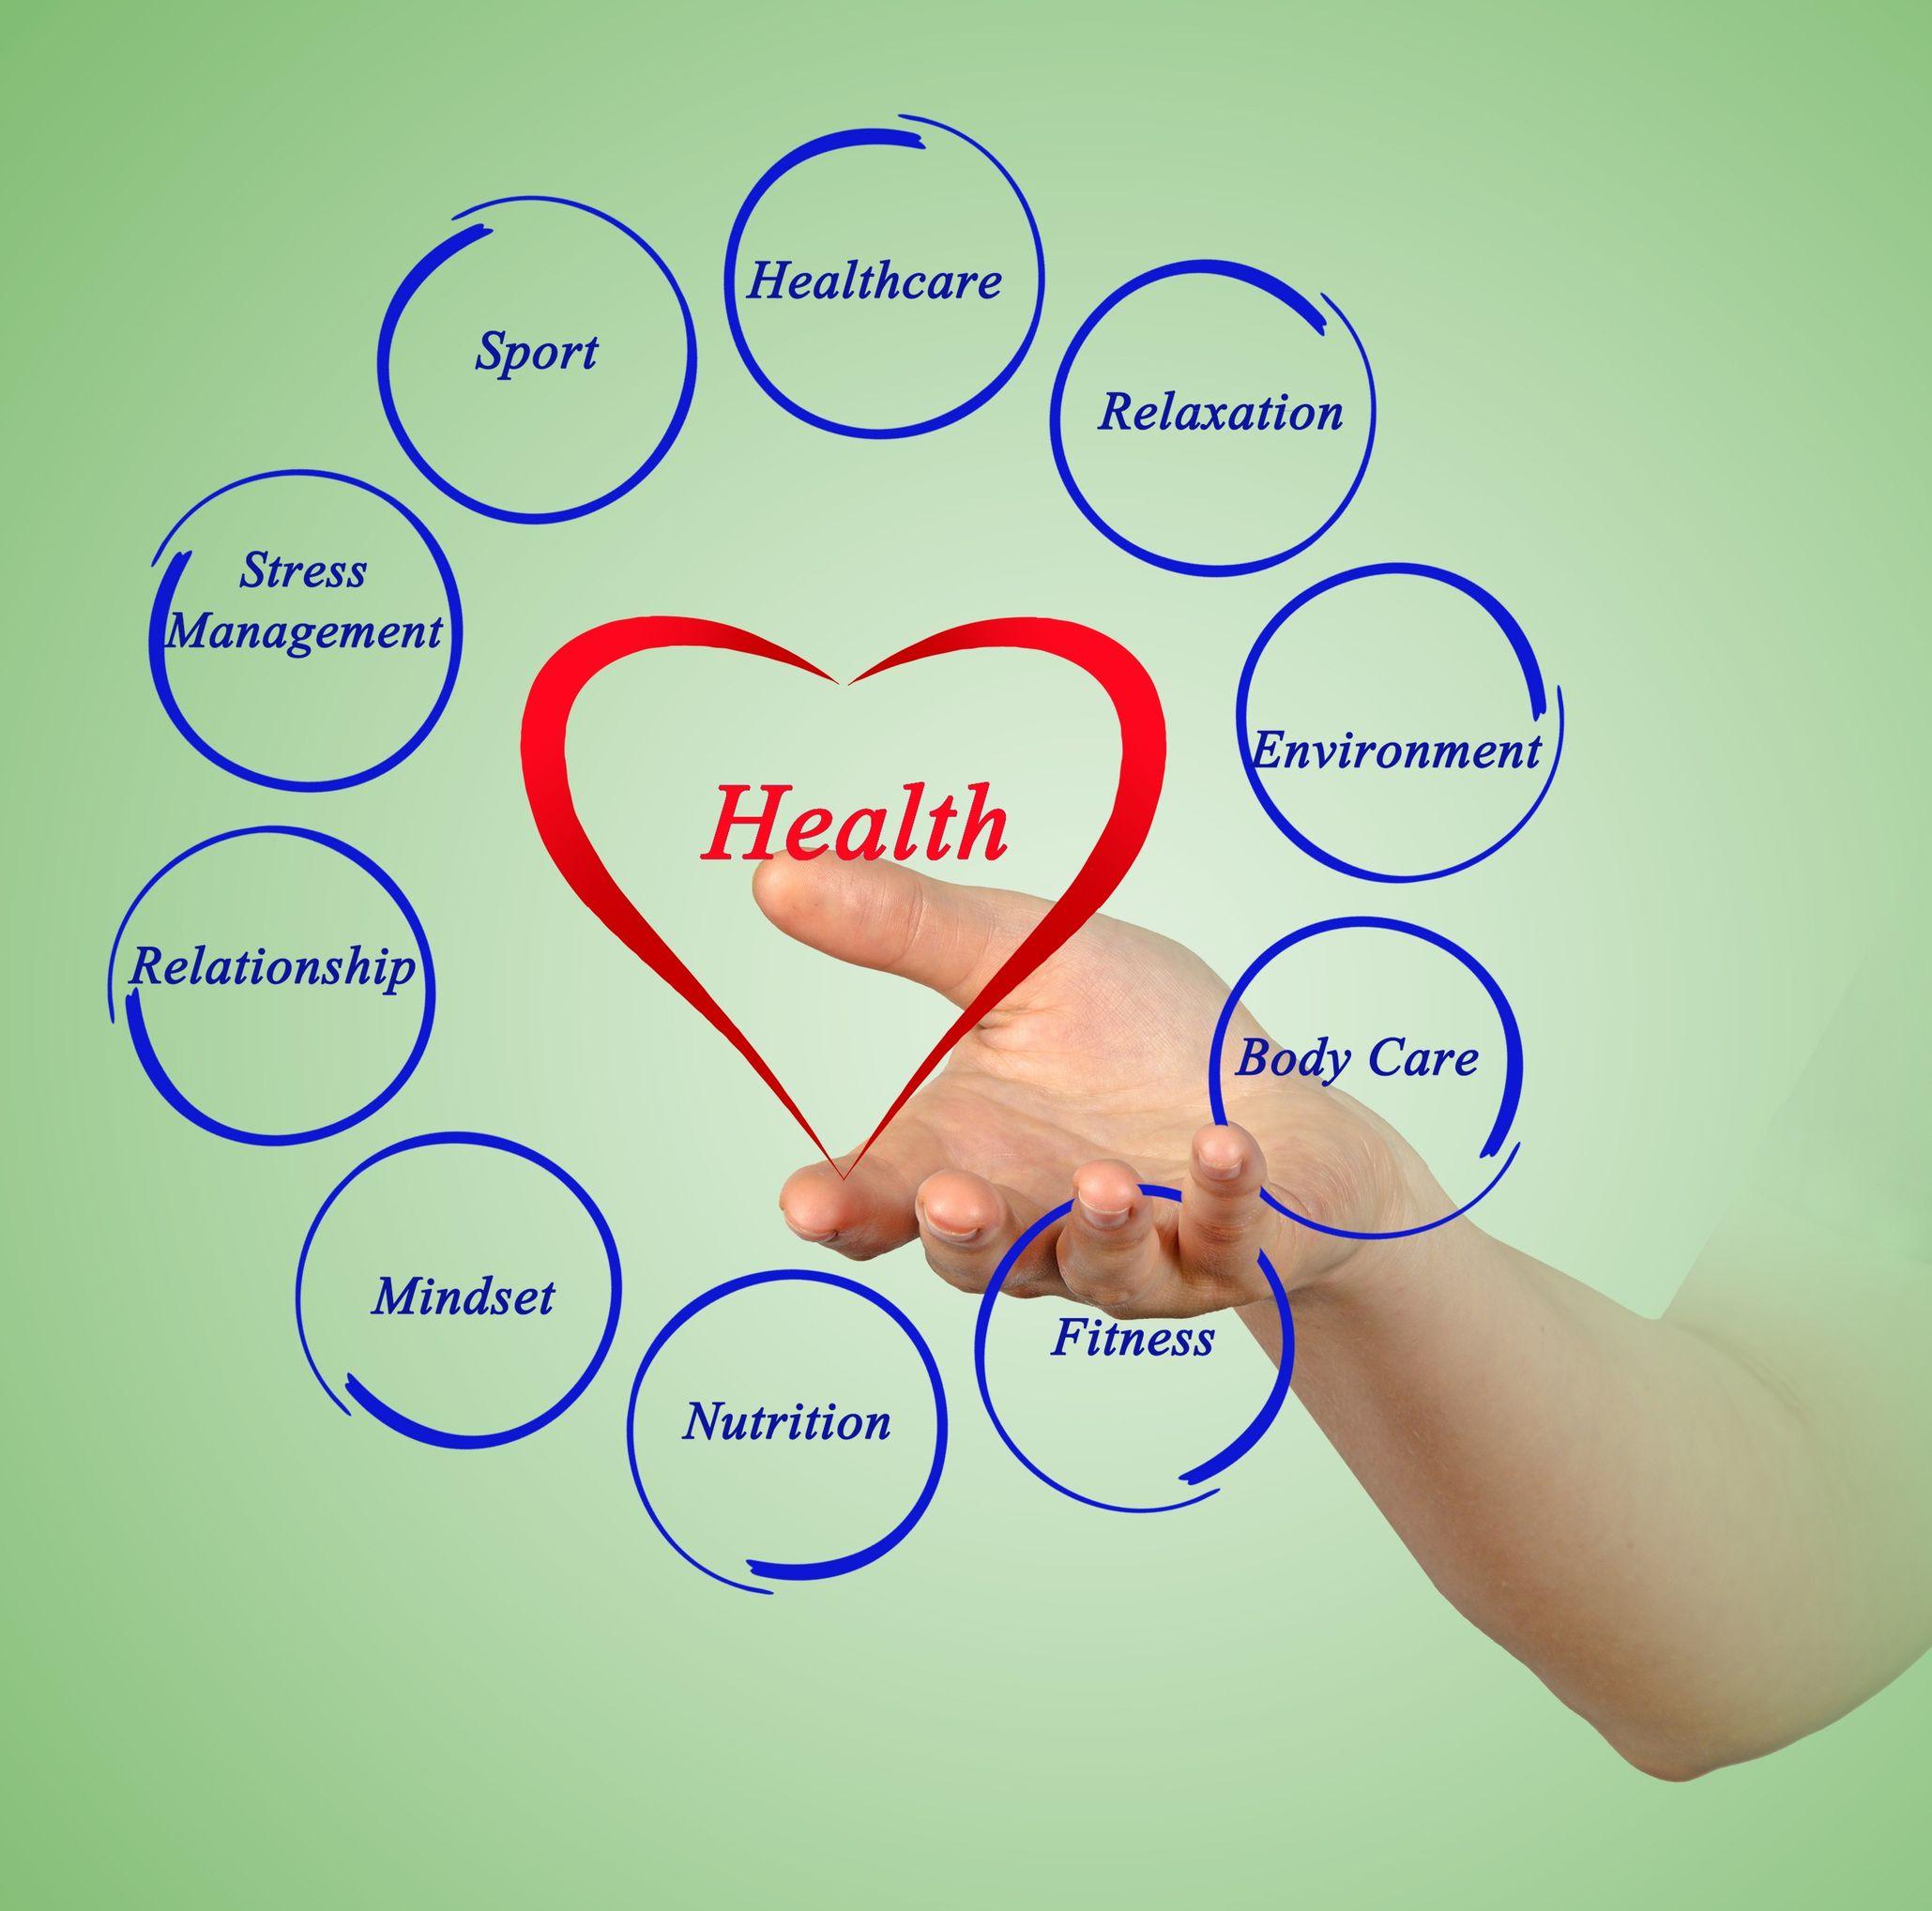 http://bilalisgynaikologos.gr/wp-content/uploads/2015/07/health11-1.jpg